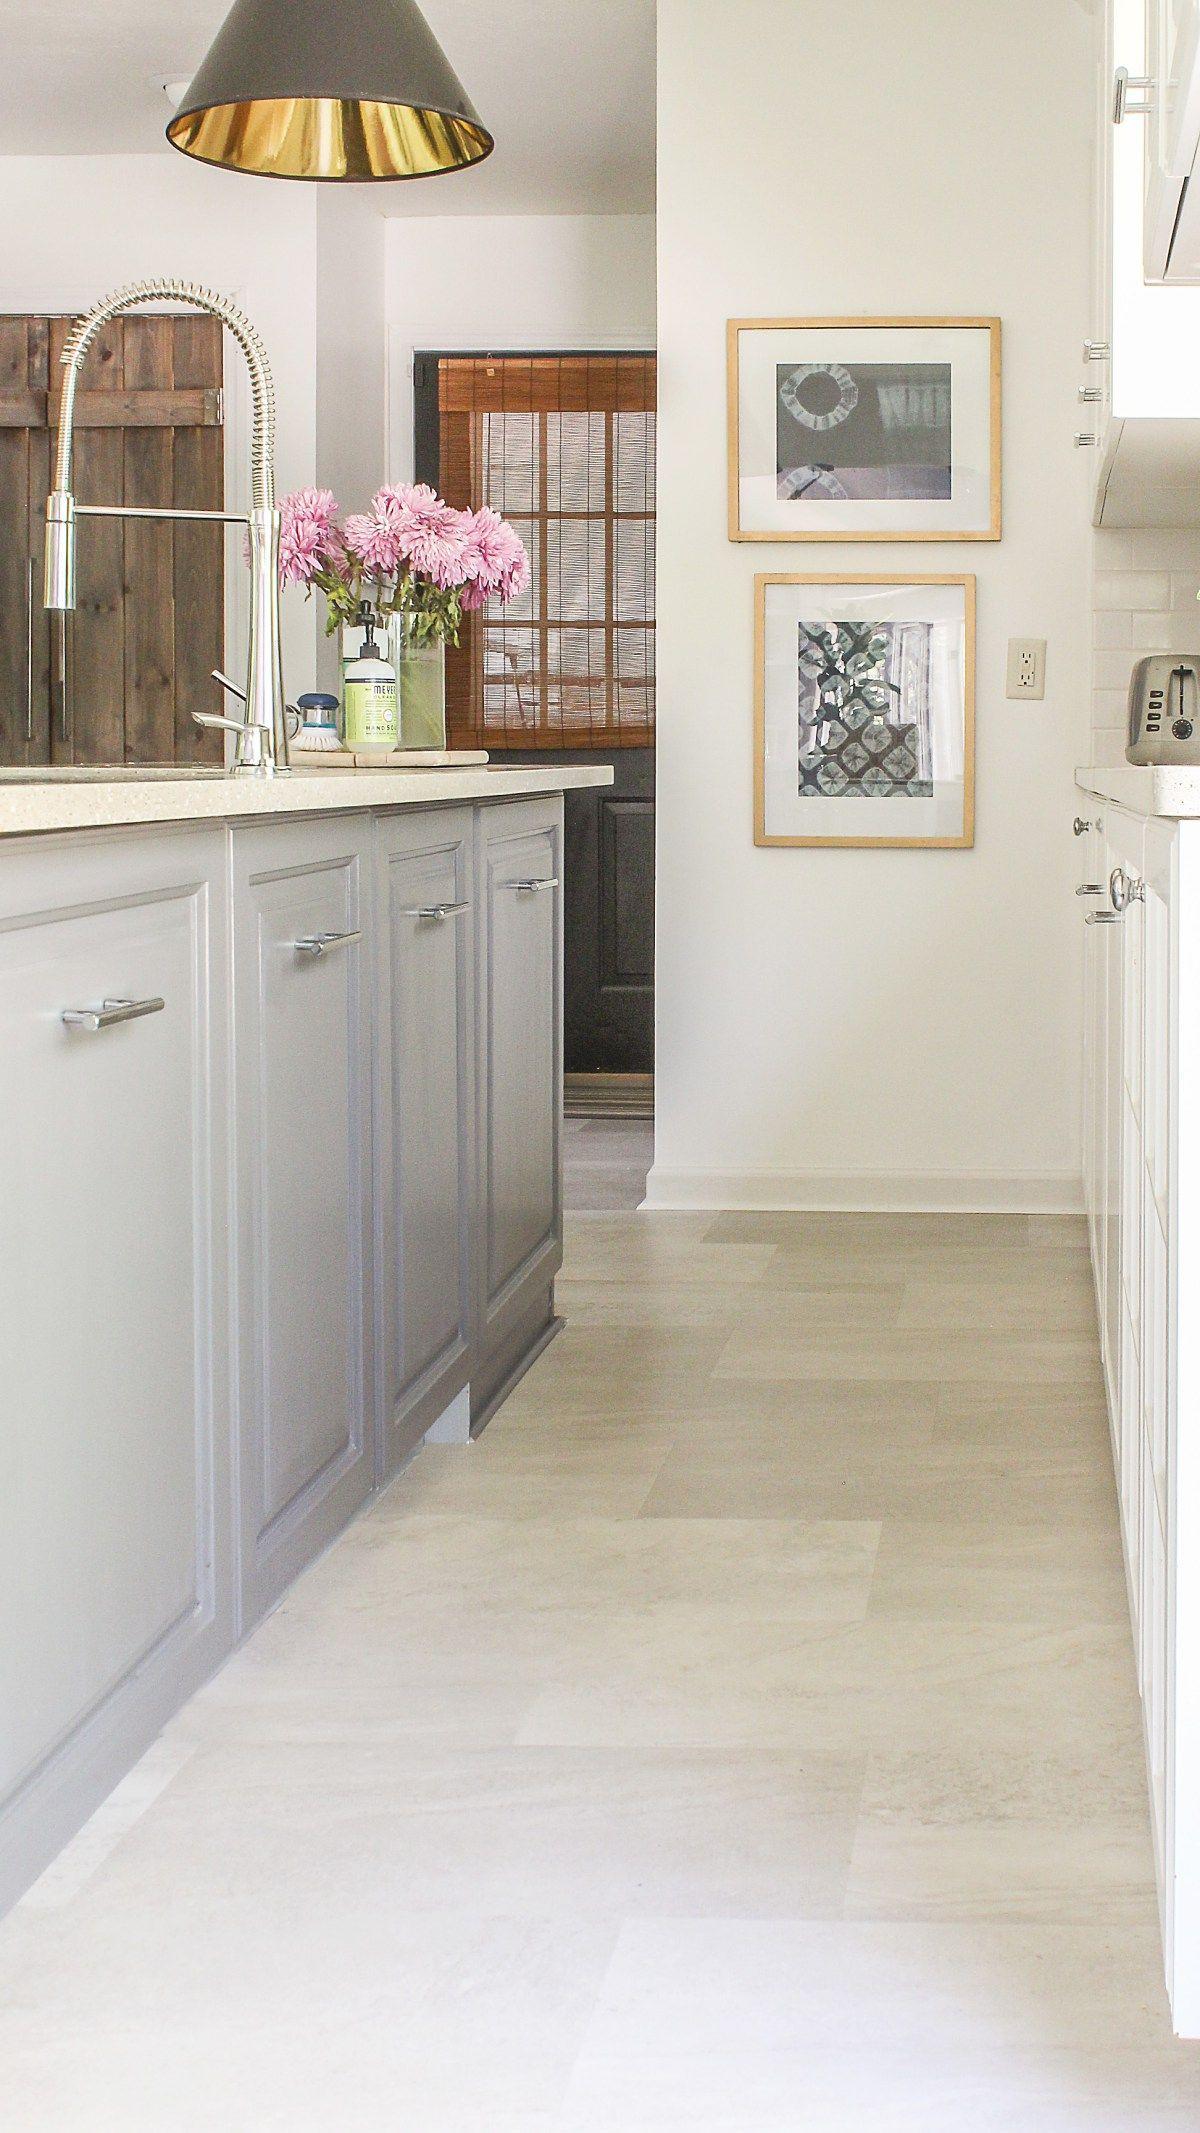 hardwood floor installation fee of lvt flooring over existing tile the easy way vinyl floor within luxury vinyl flooring installation in kitchen over existing tile tutorial